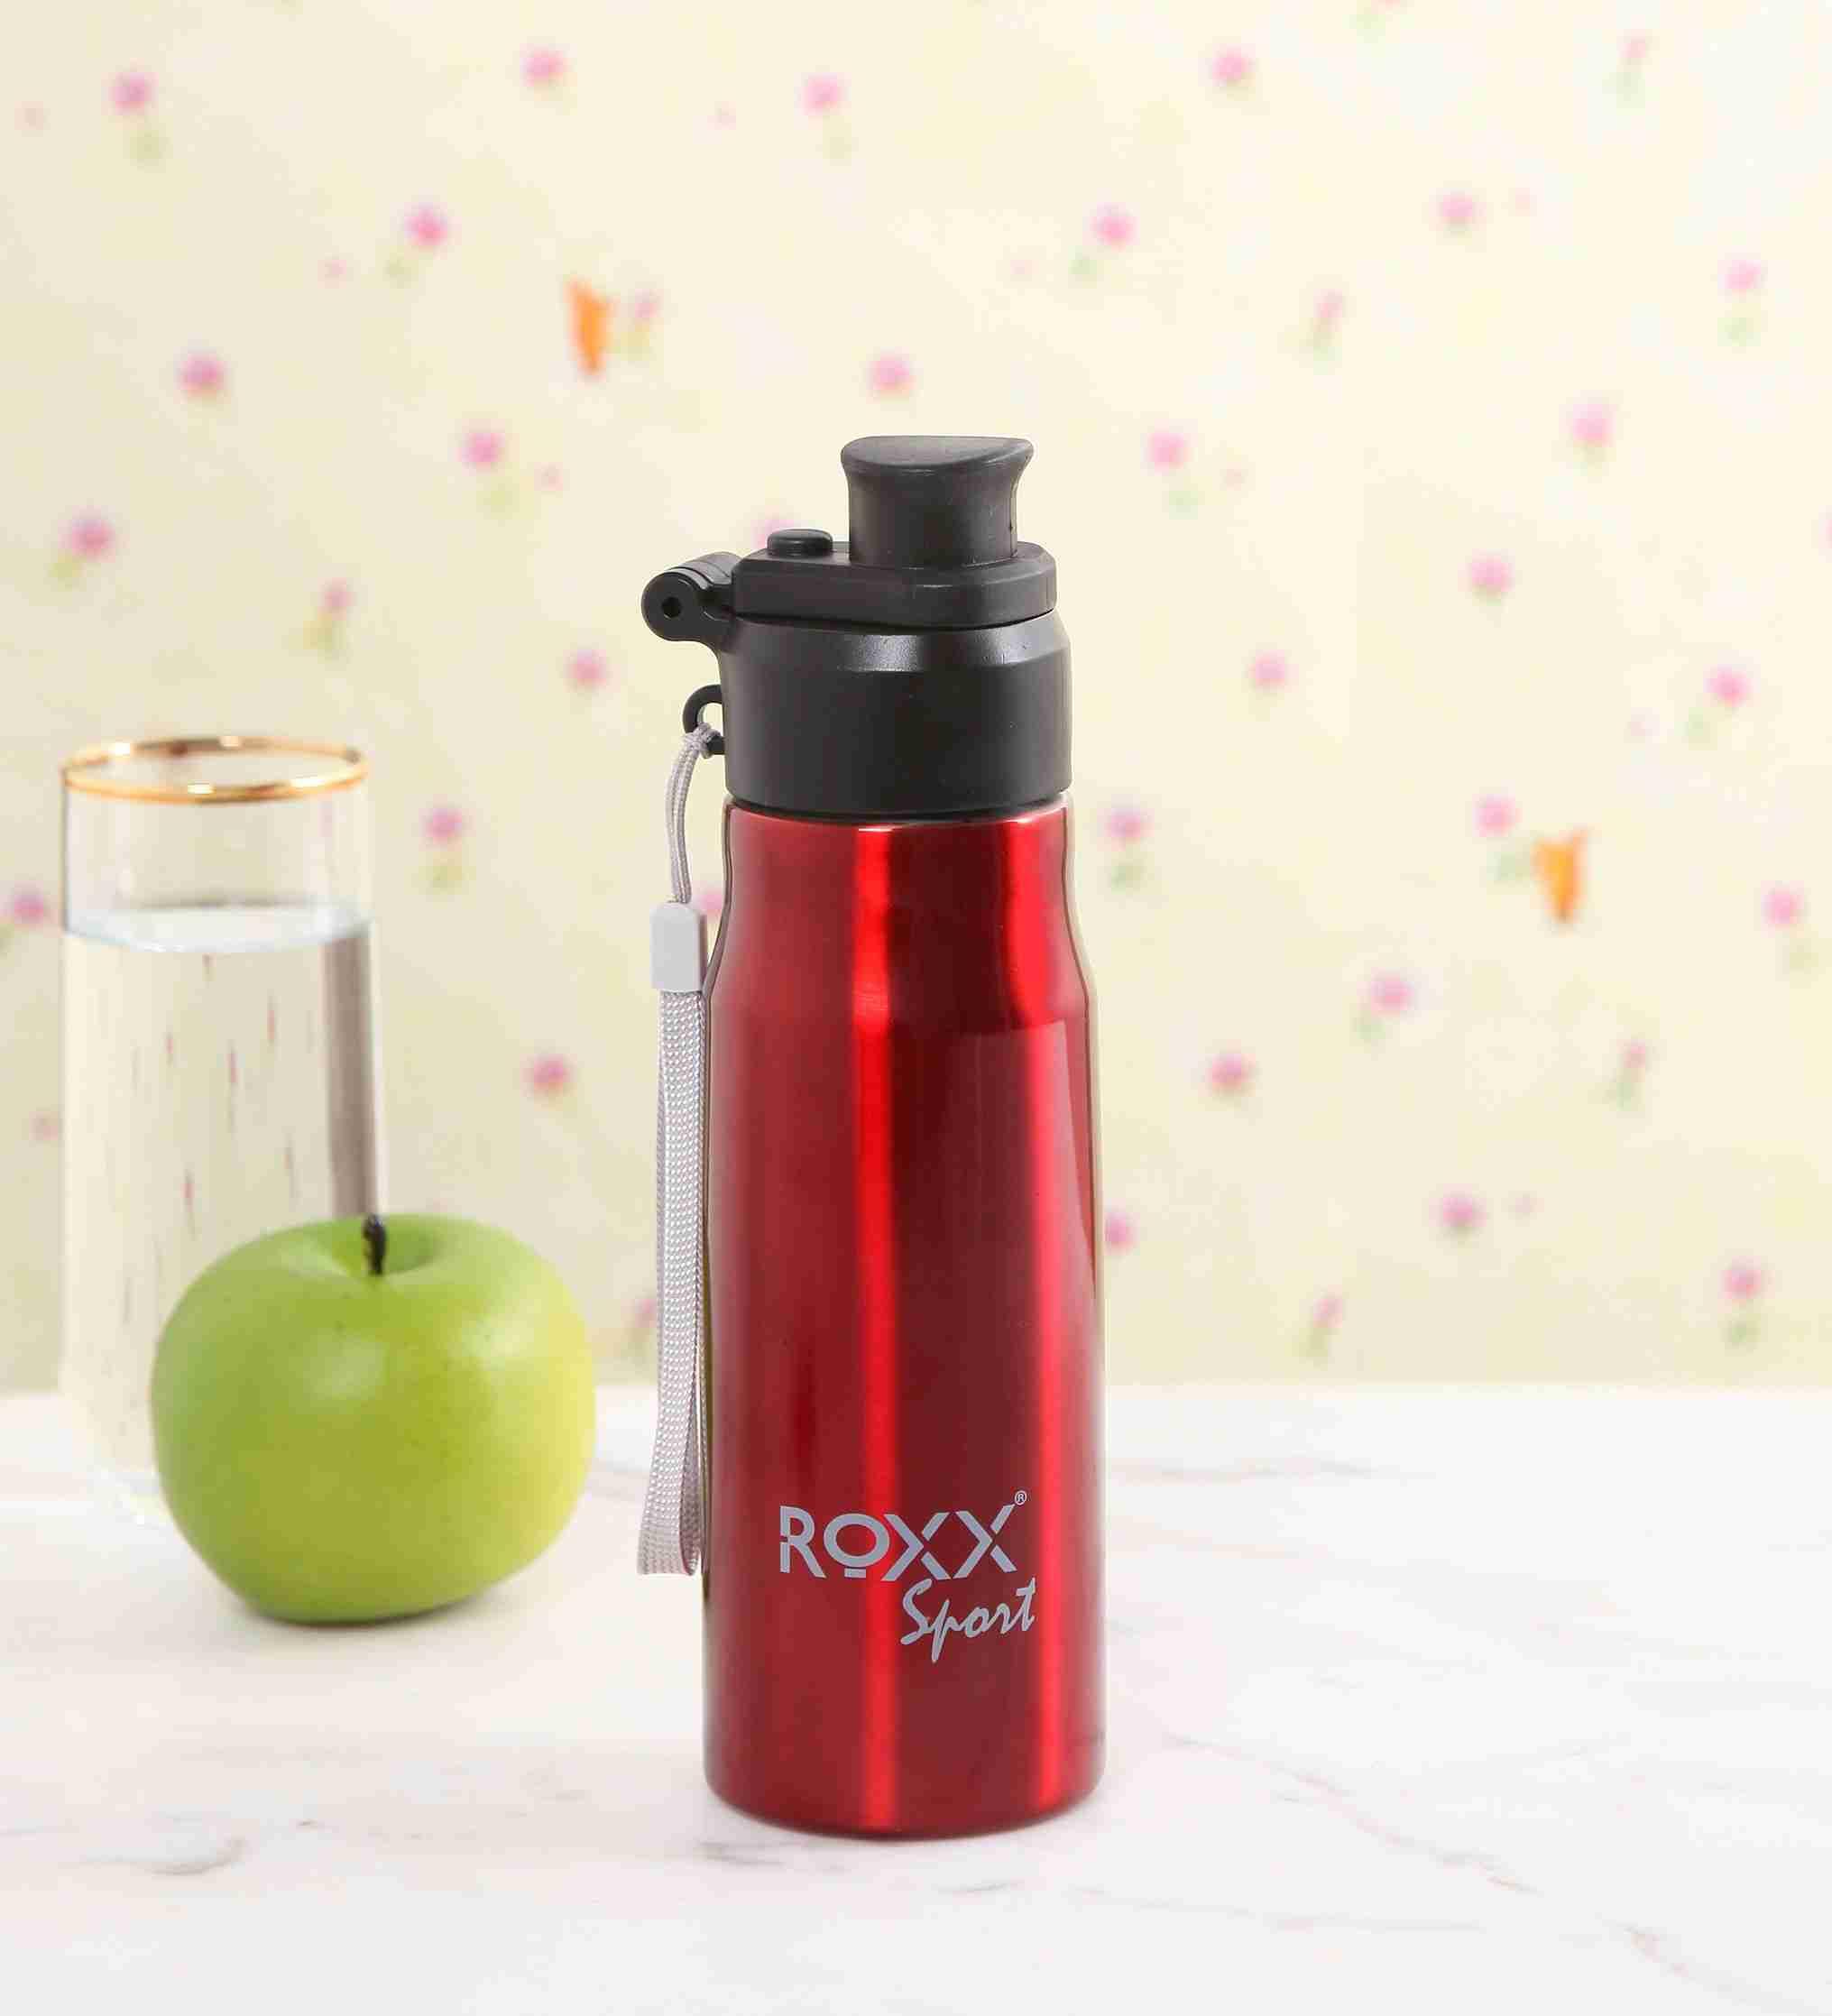 Roxx - Home page